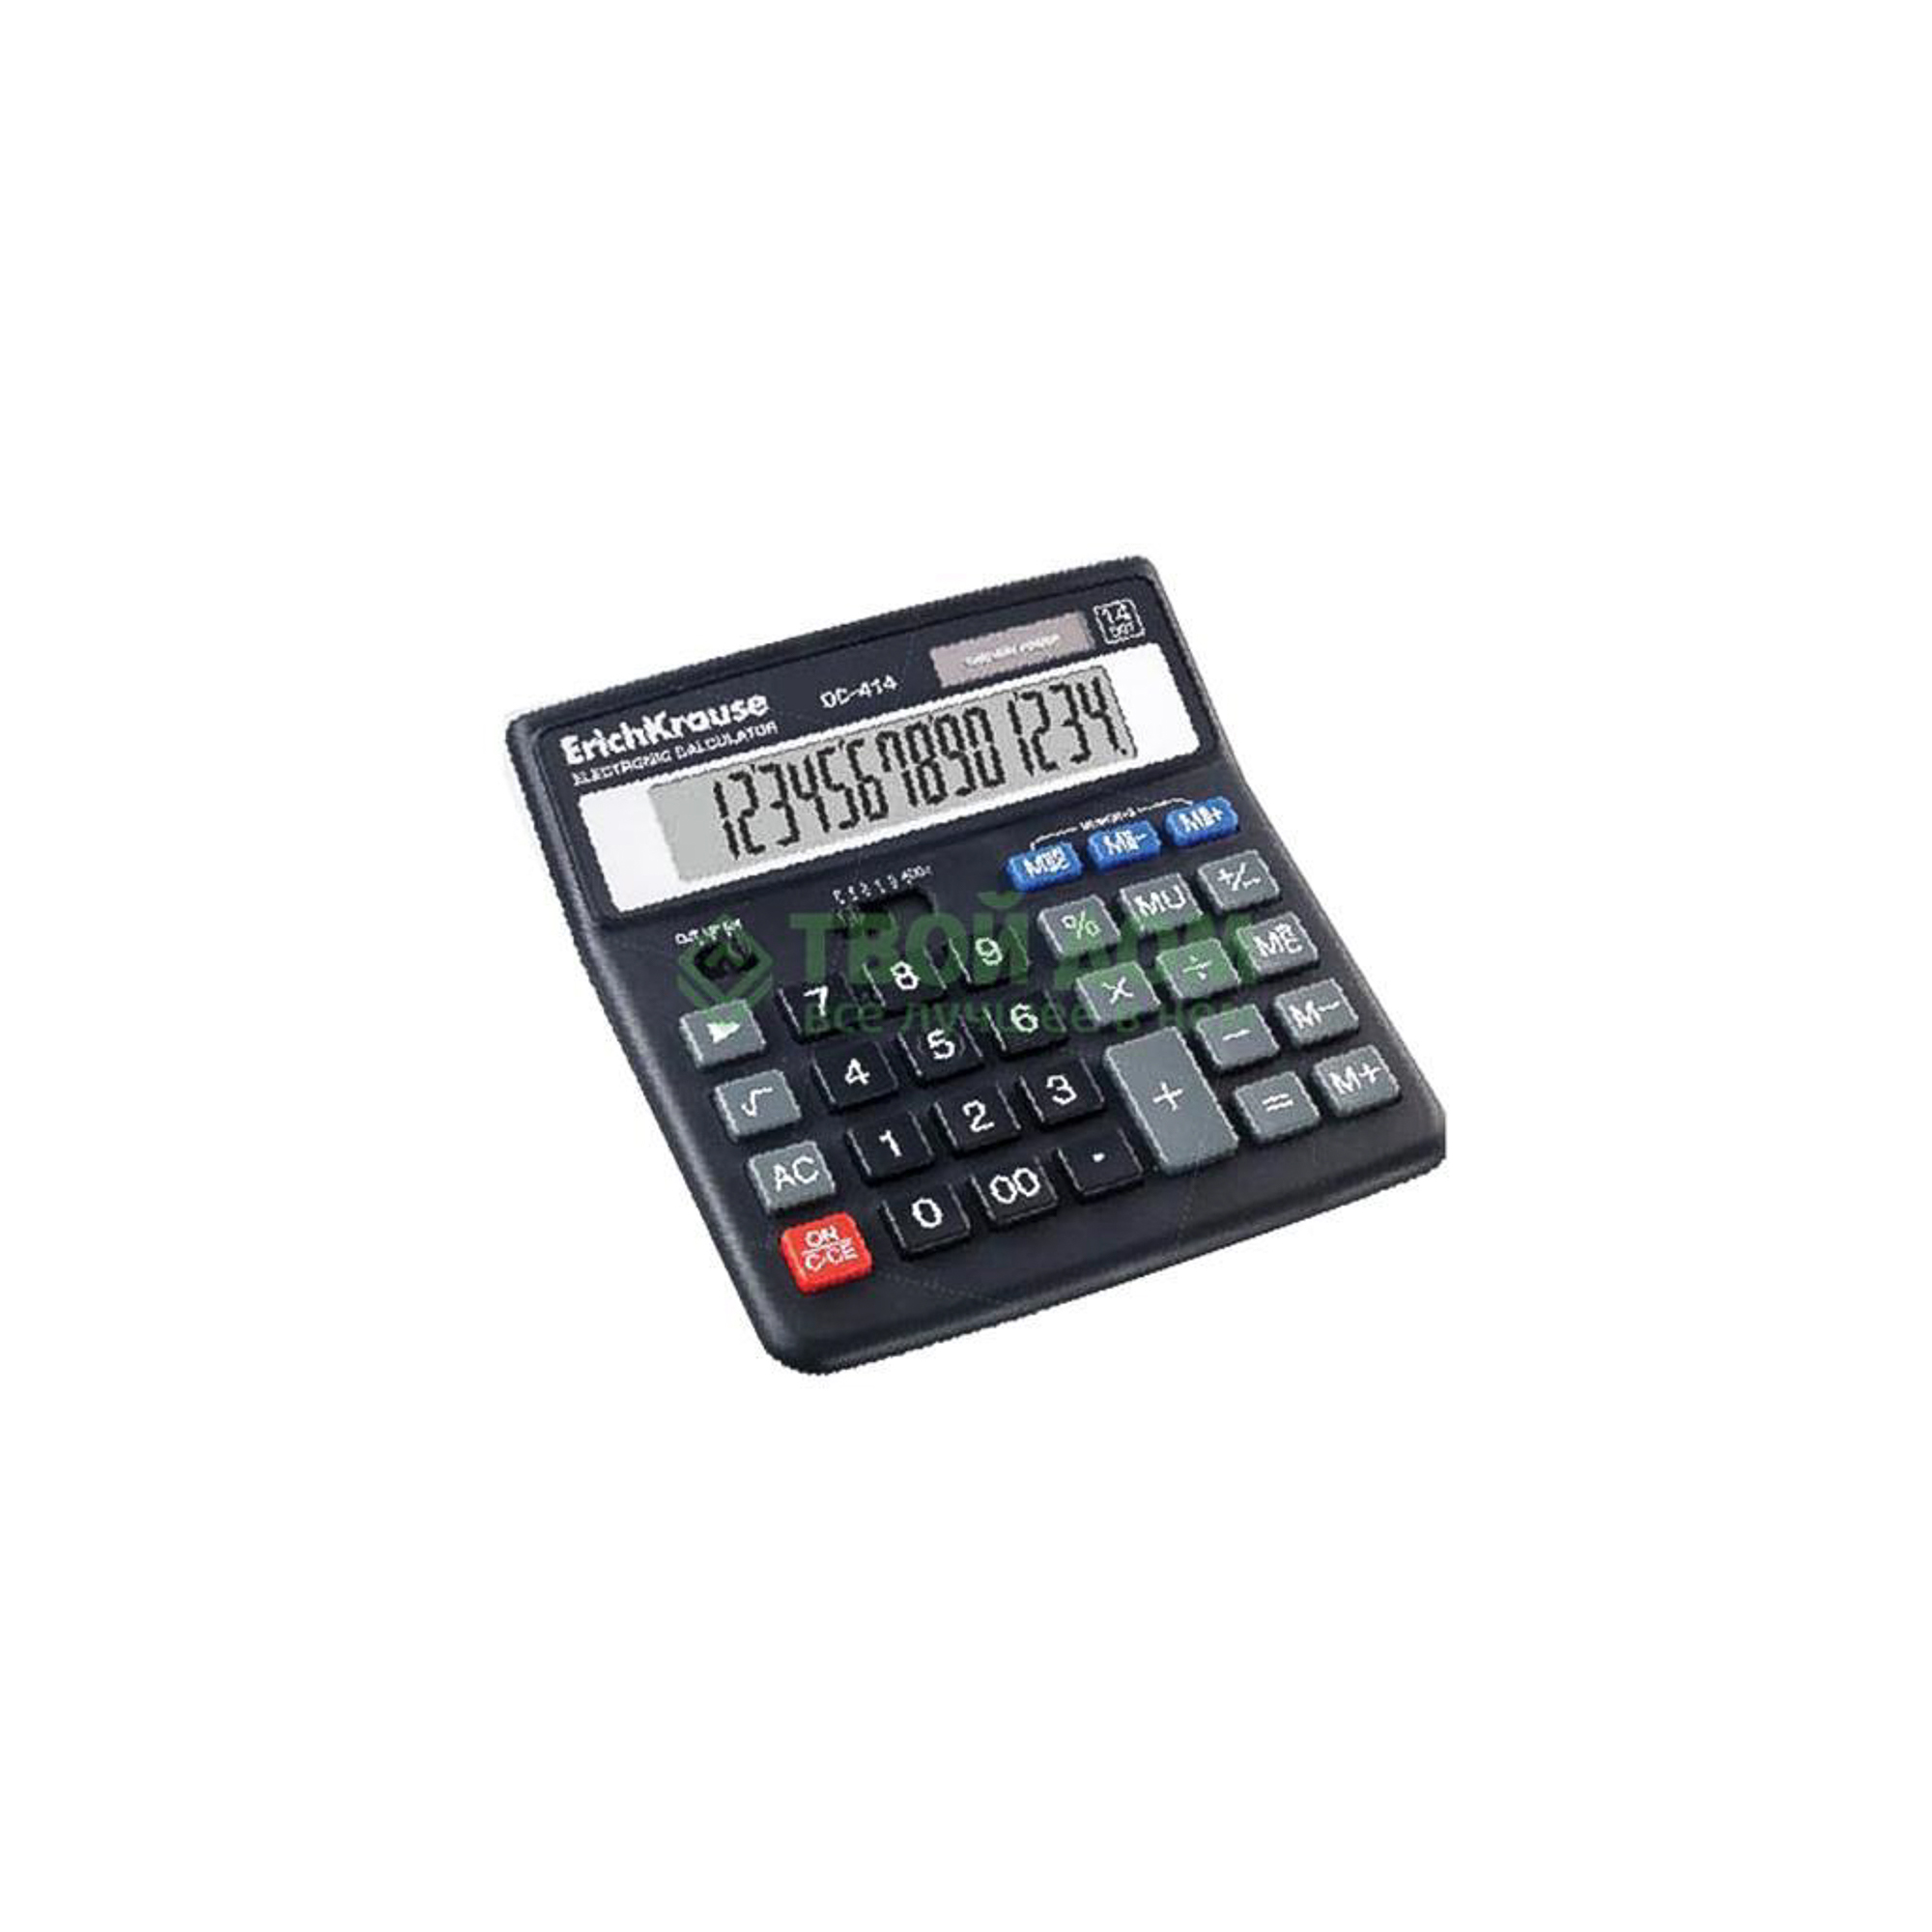 Калькулятор Erich Krause 40416 фото